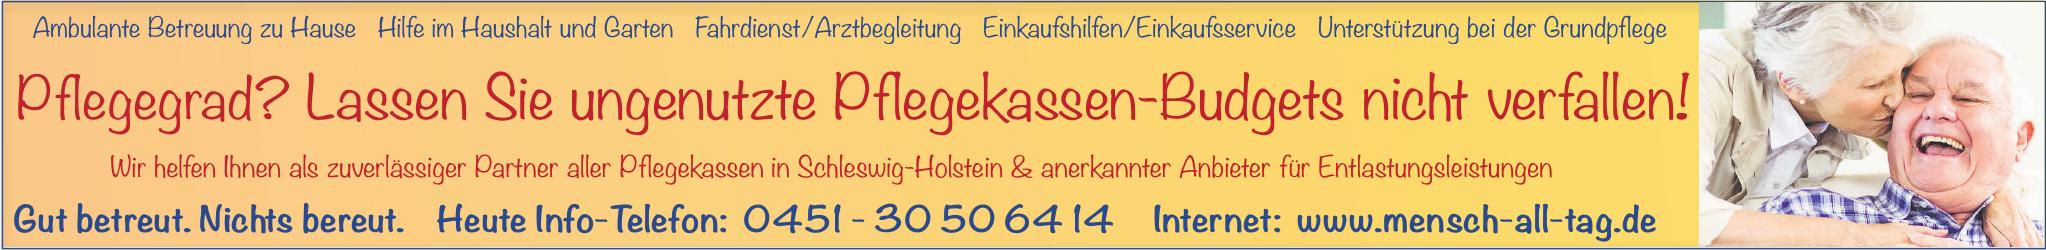 Mensch-all-Tag GmbH